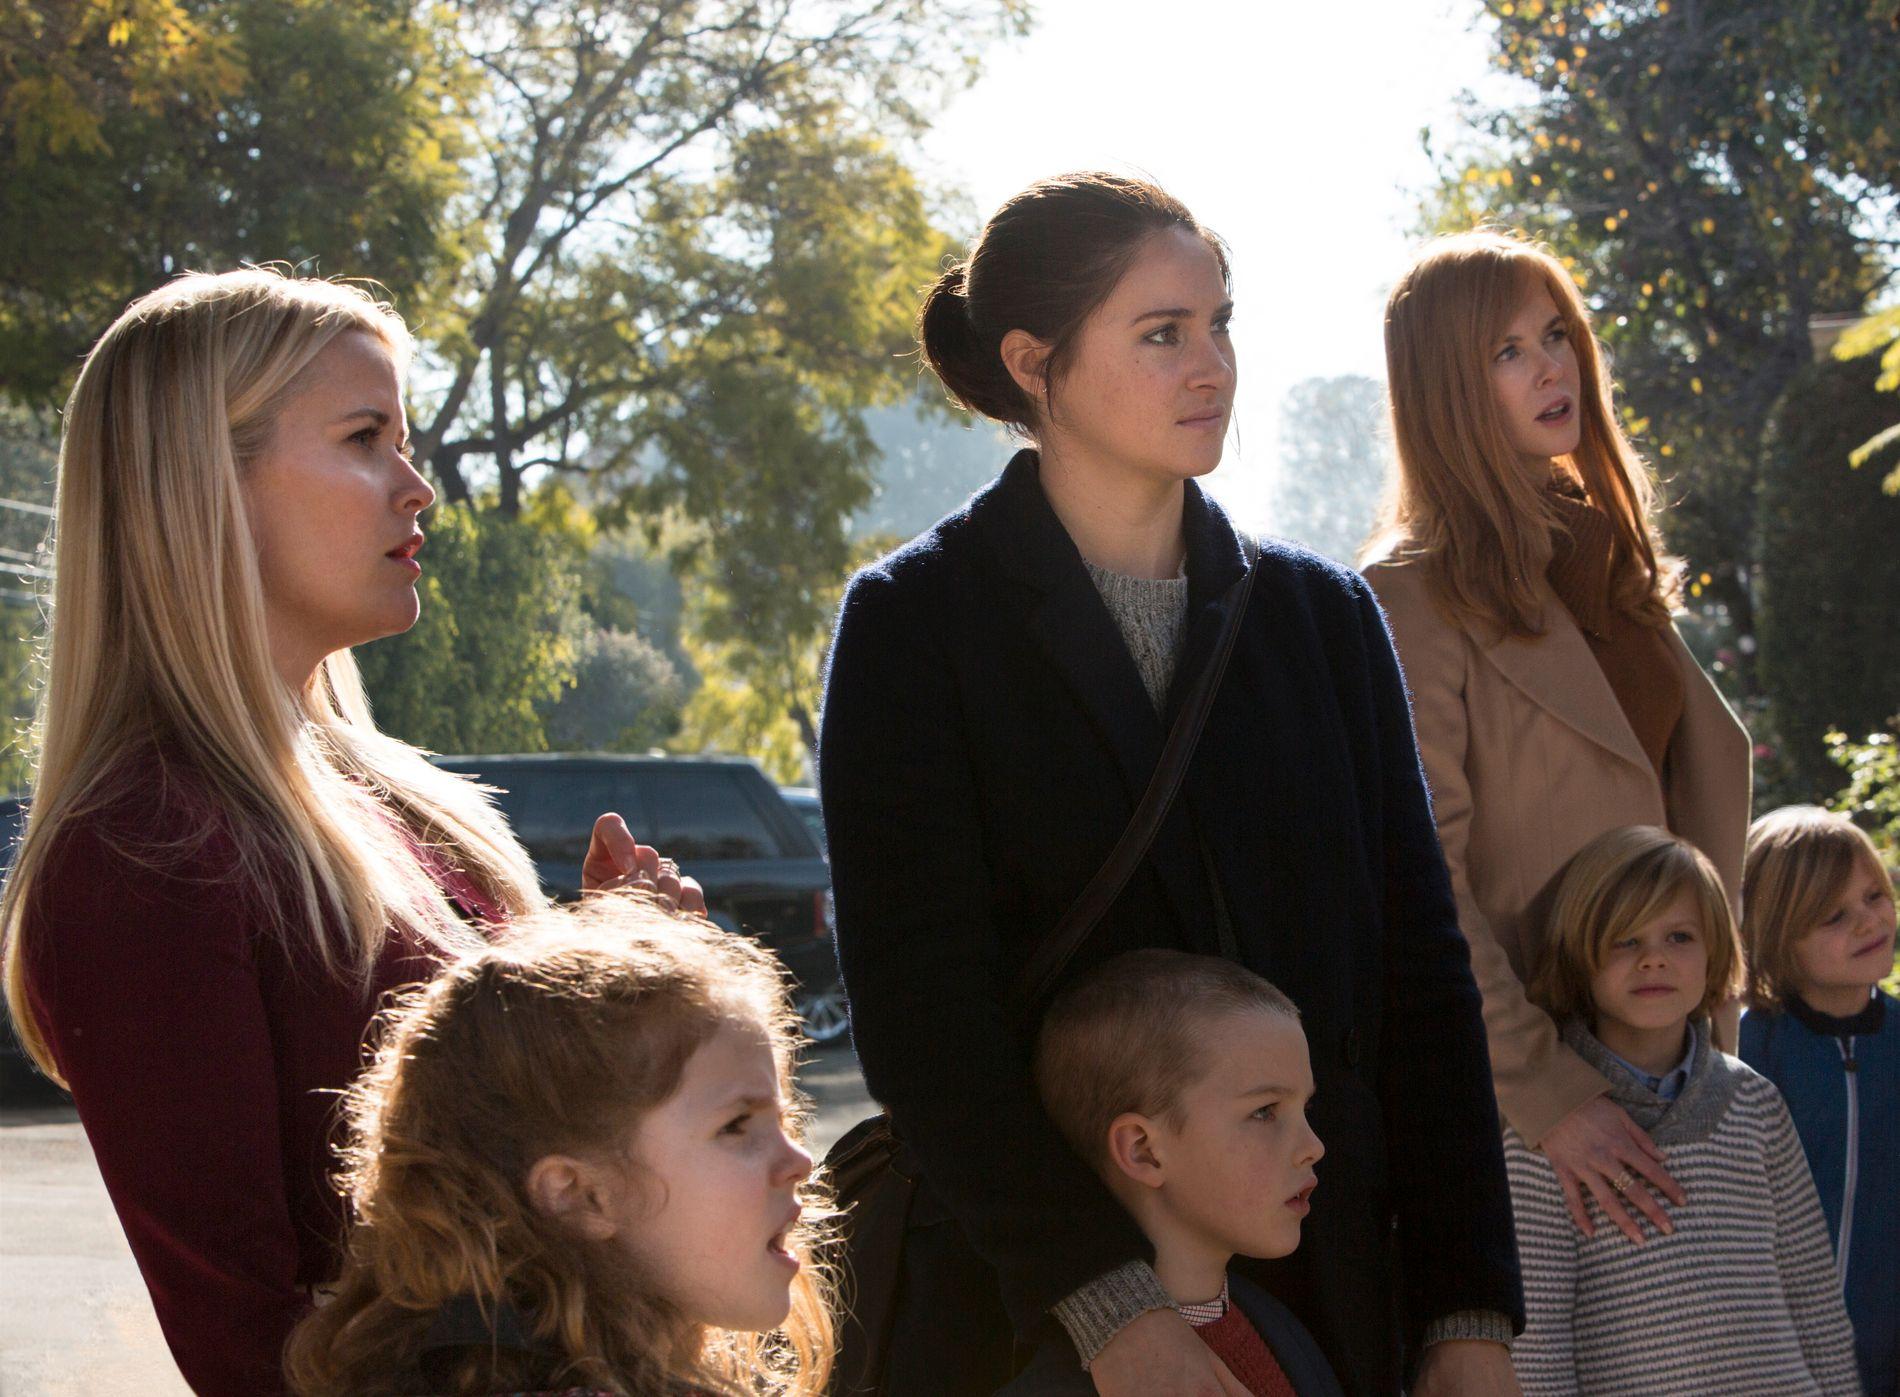 FASADEPERFEKT: Reese Witherspoon, Shailene Woodley og Nicole Kidman i «Big Little Lies».